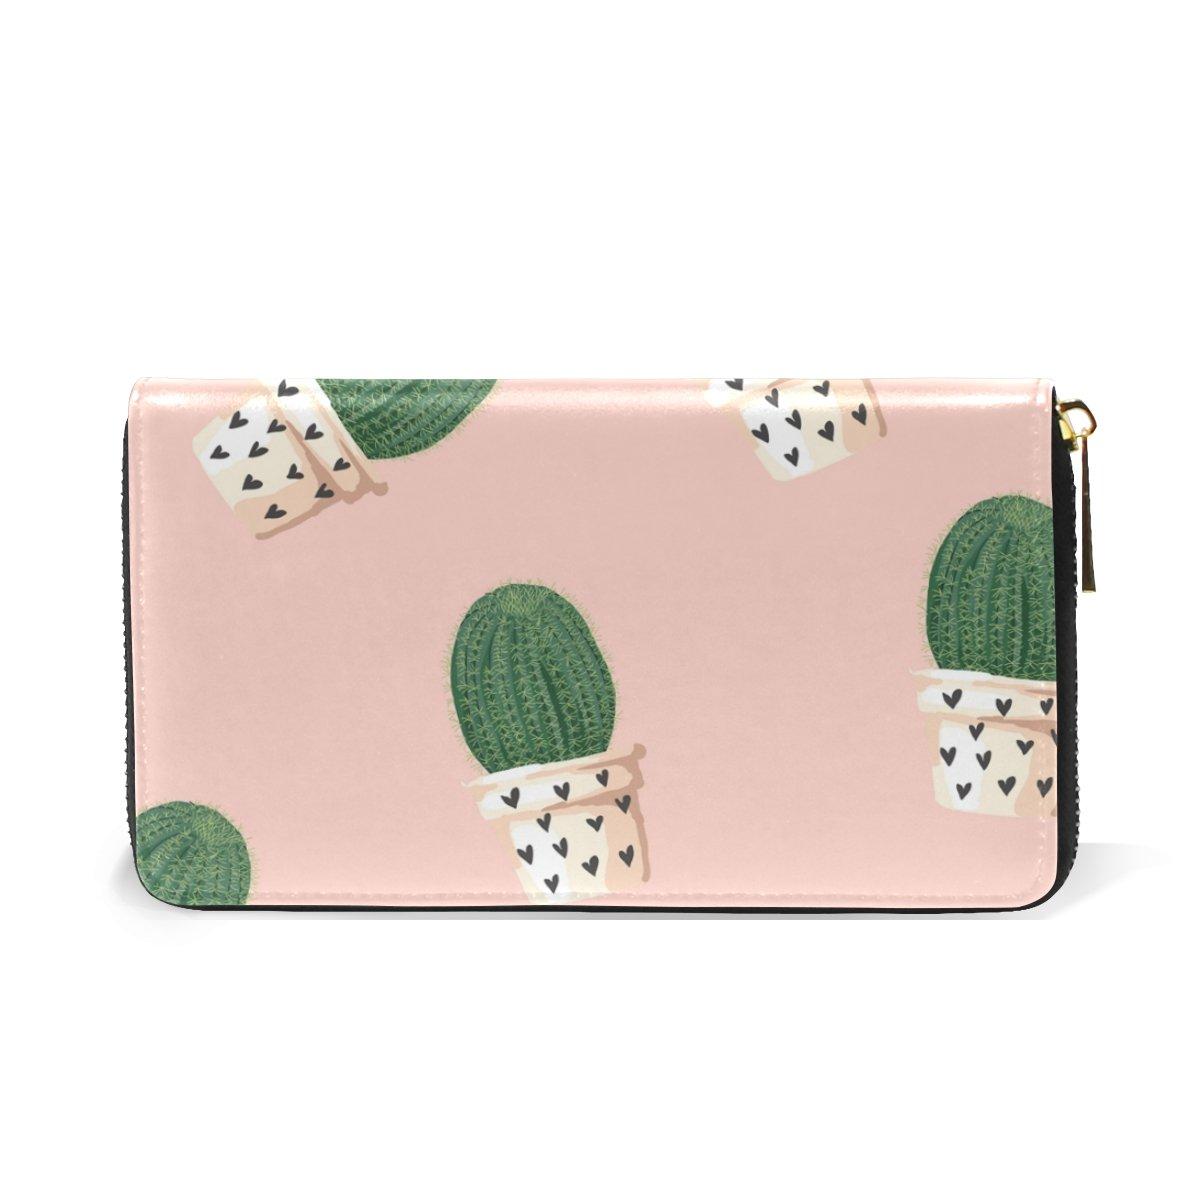 LAVOVO Cute Cactus Love Womens Clutch Purses Organizer And Handbags Zip Around Wallet